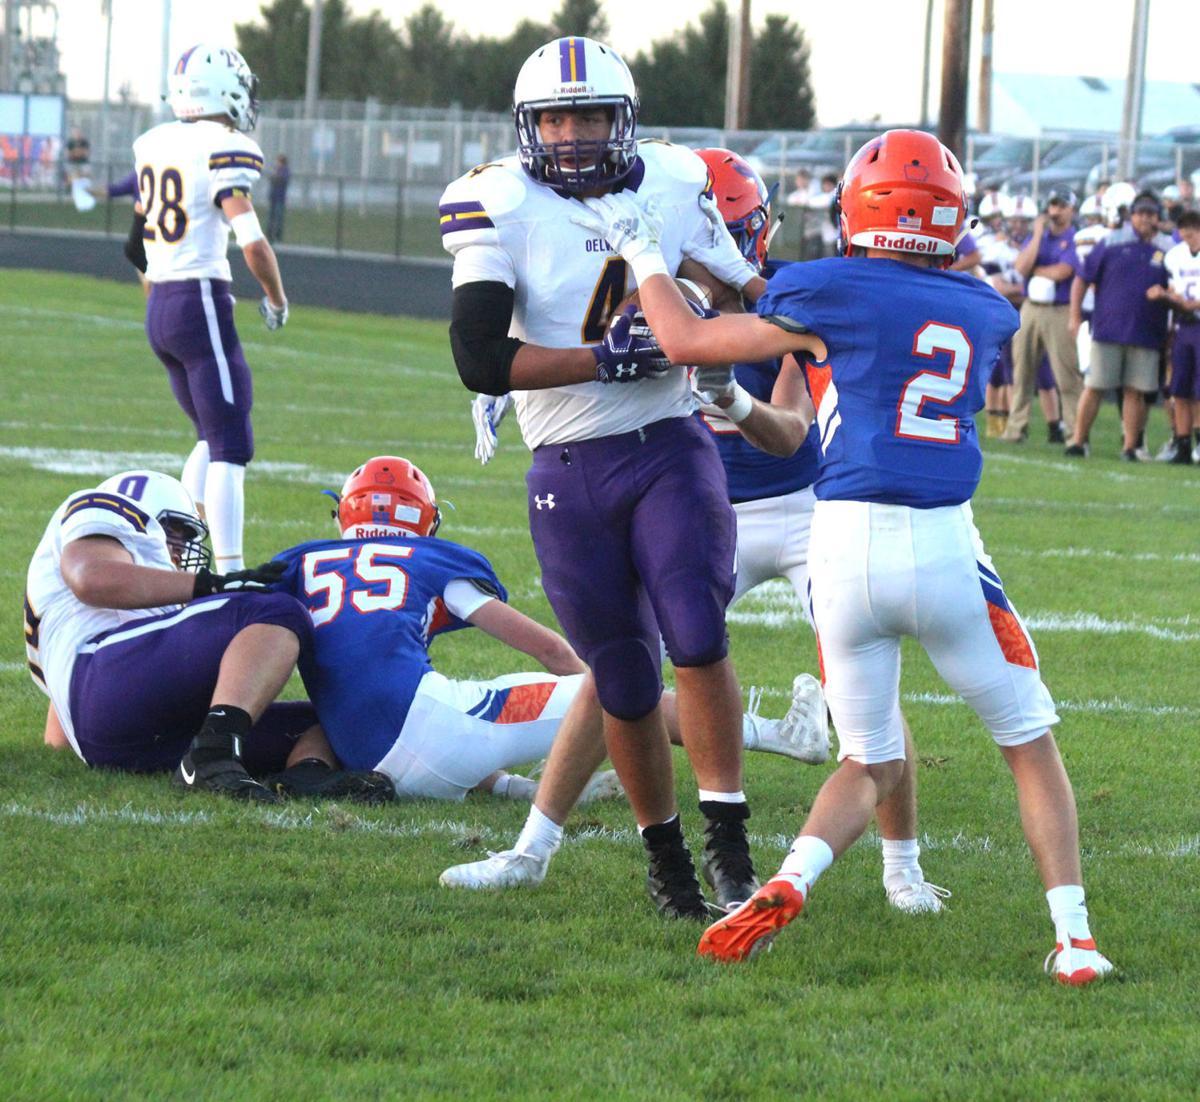 Voshell runs for five touchdowns in Oelwein win